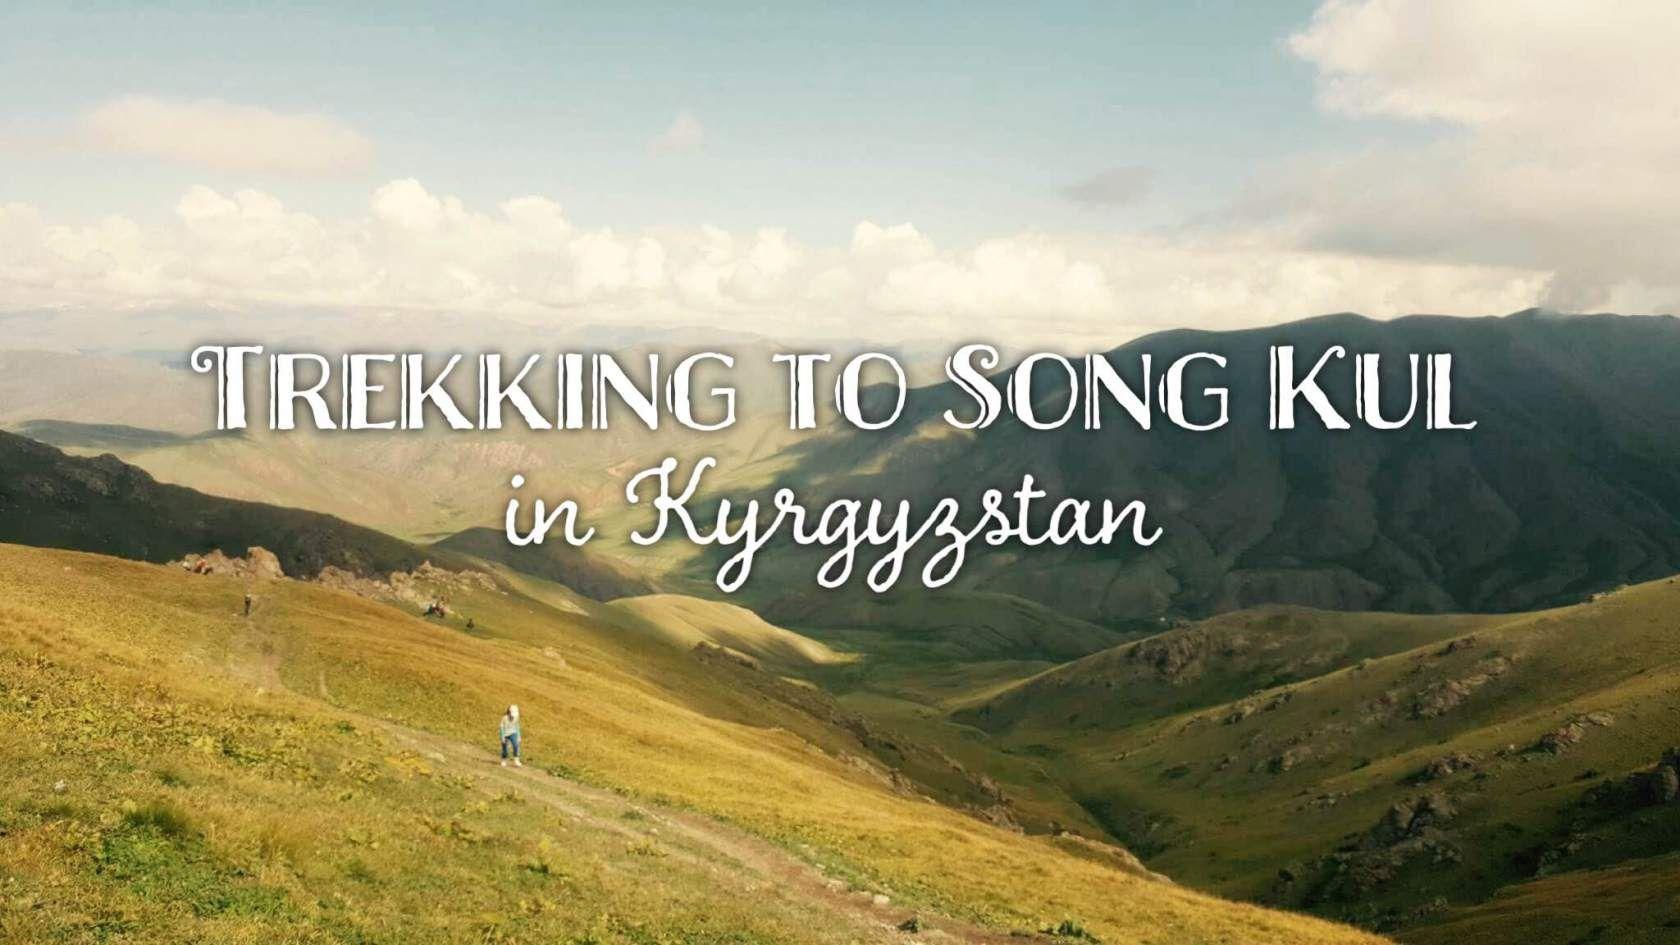 Trekking to Song Kul Kyrgyzstan